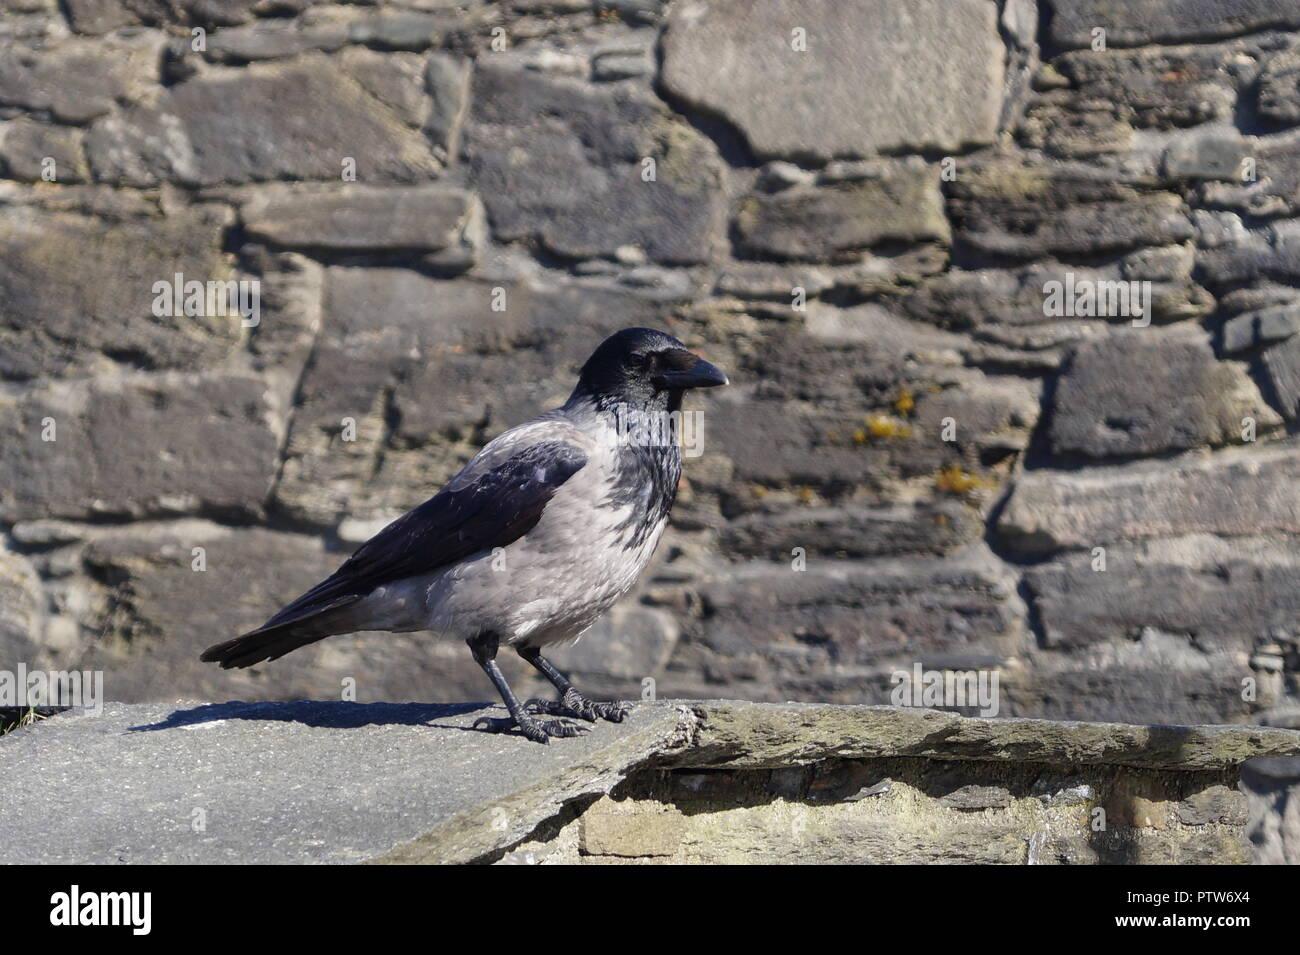 Rabe oder Krähe auf Fuerteventura - Corvus Corax Stockbild